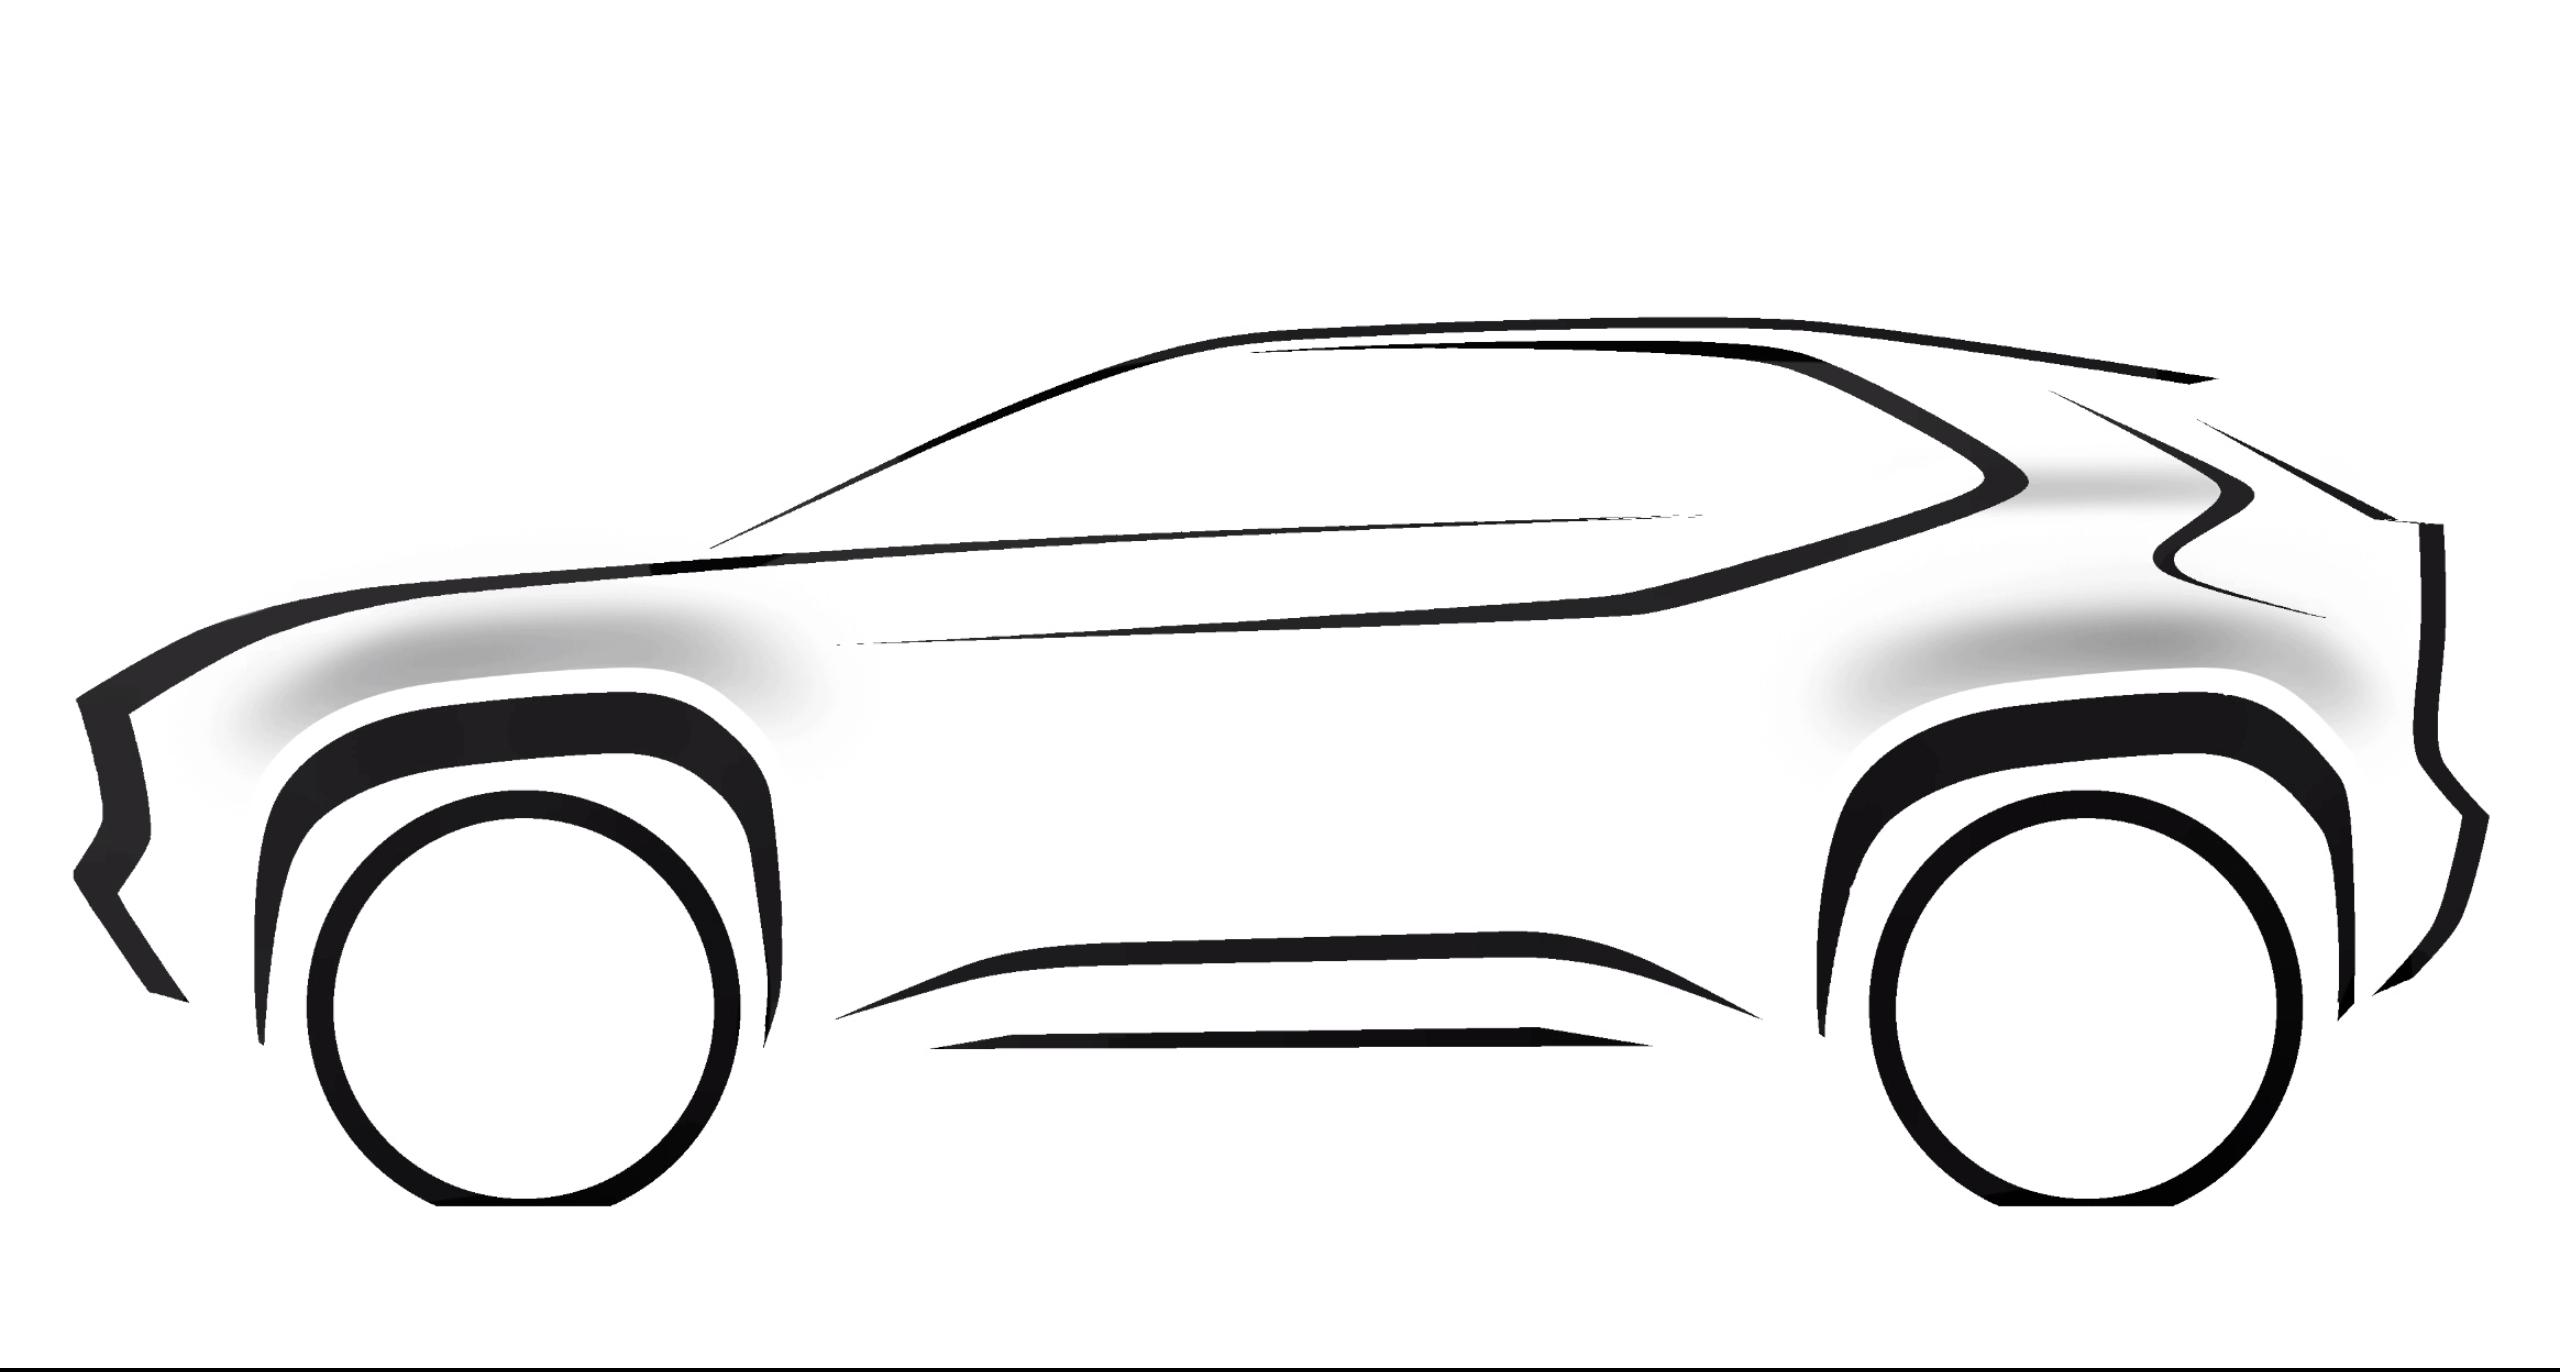 New Toyota crossover